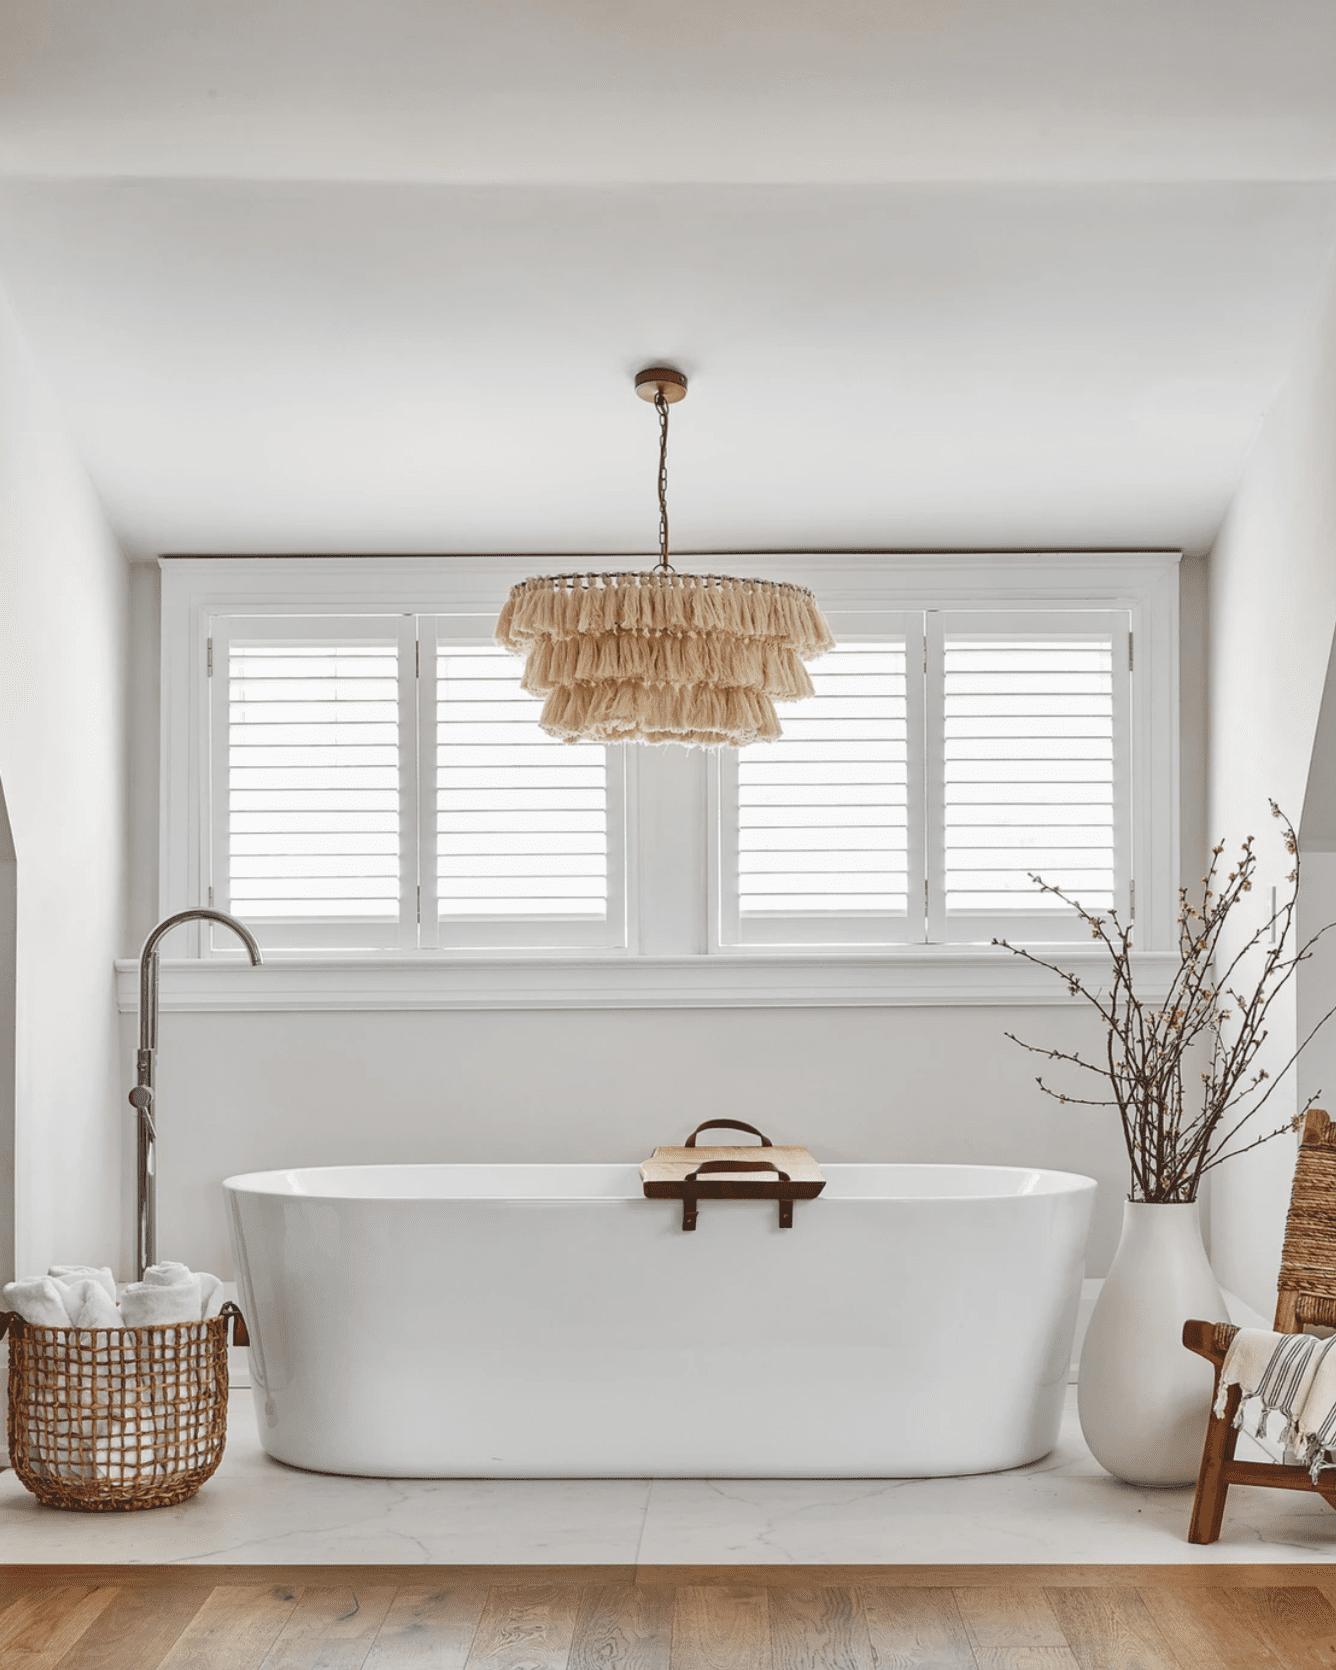 20 Best Blissfully Gorgeous Spa Bathrooms, Spa Bathroom Ideas